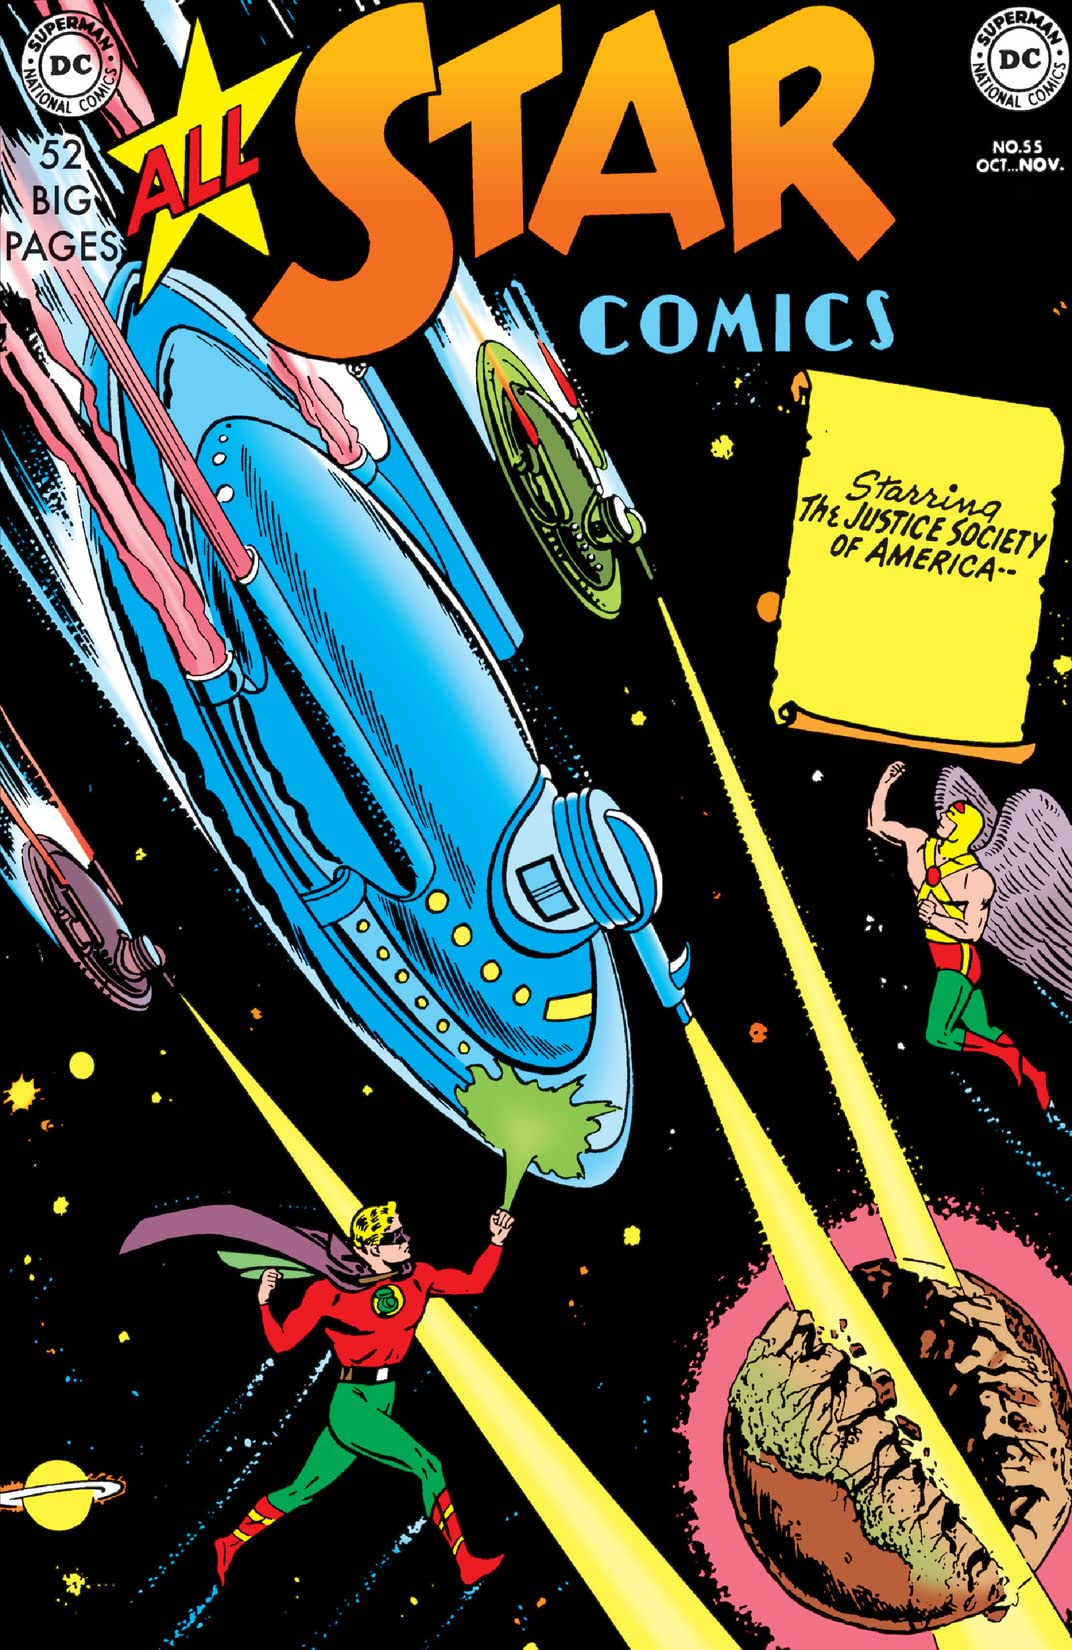 All-Star Comics #55